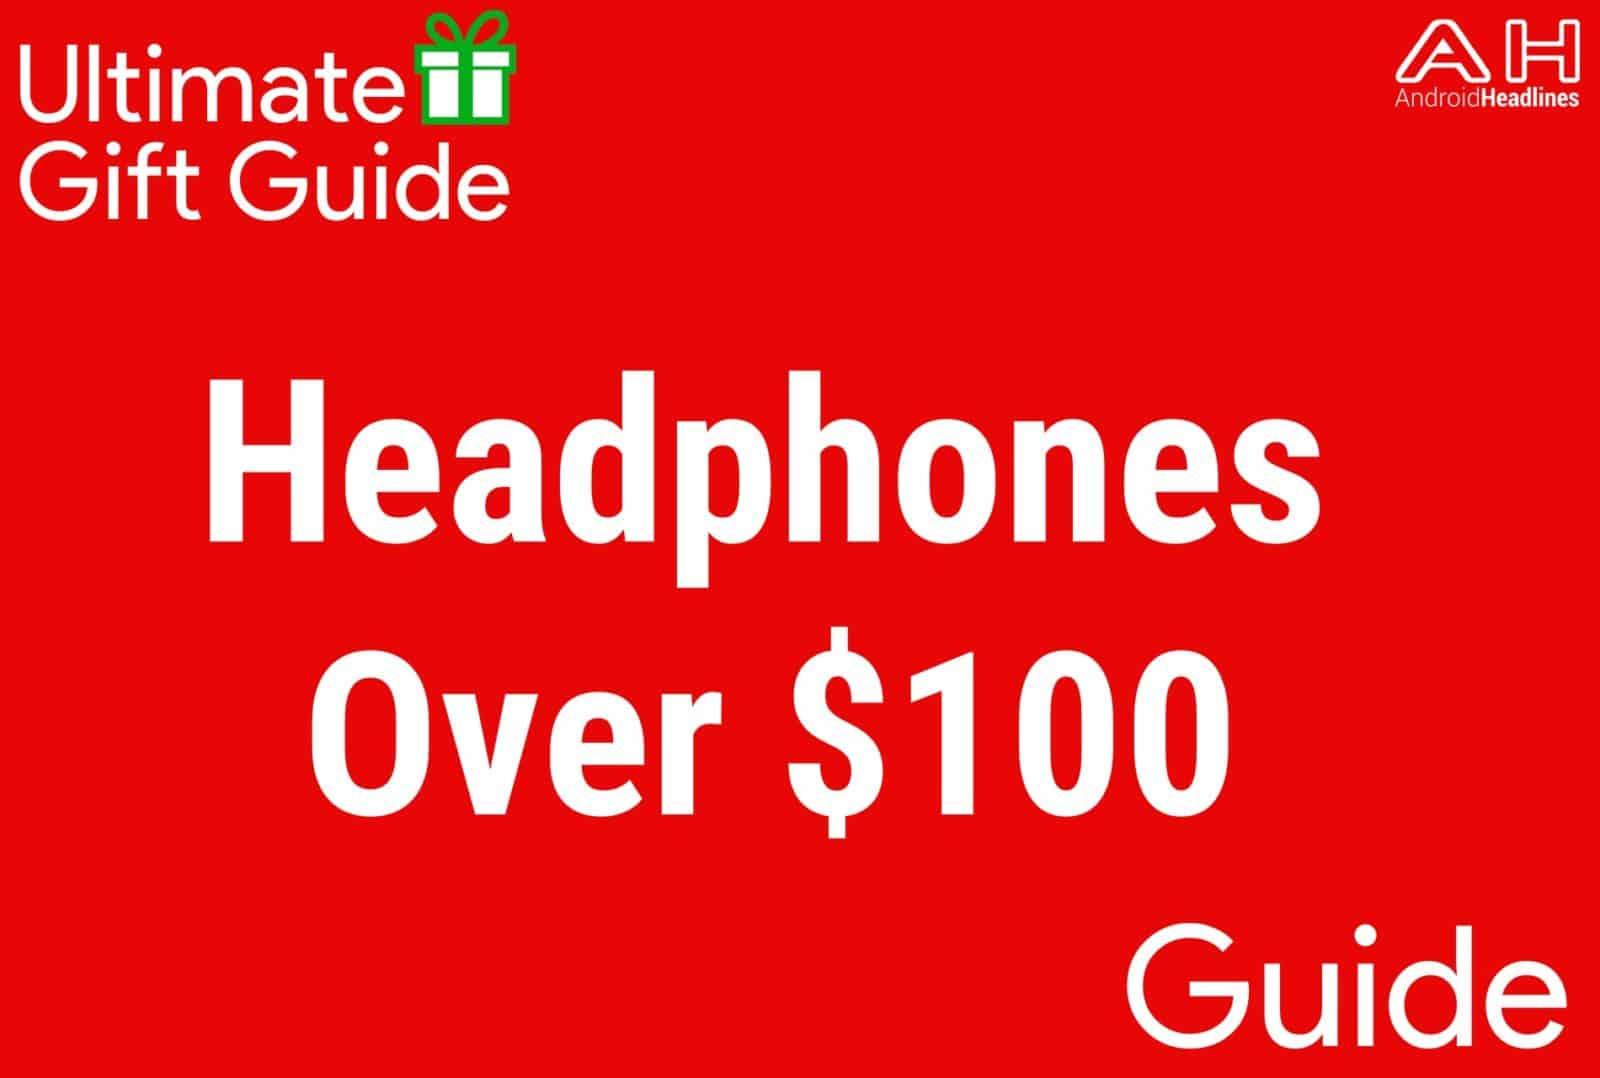 Headphones Over $100 - Gift Guide 2015